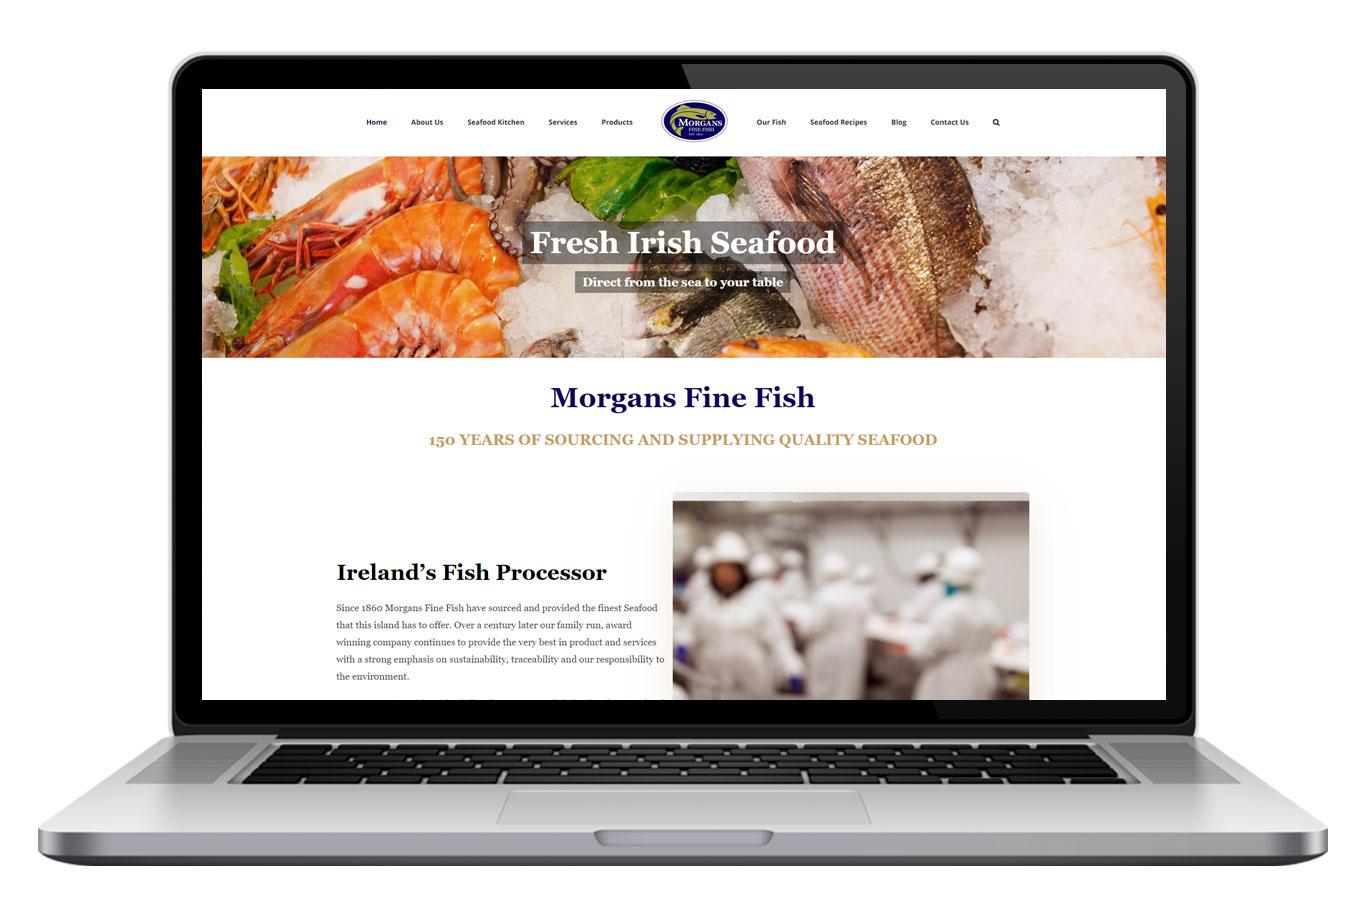 Morgans Fine Fish Website